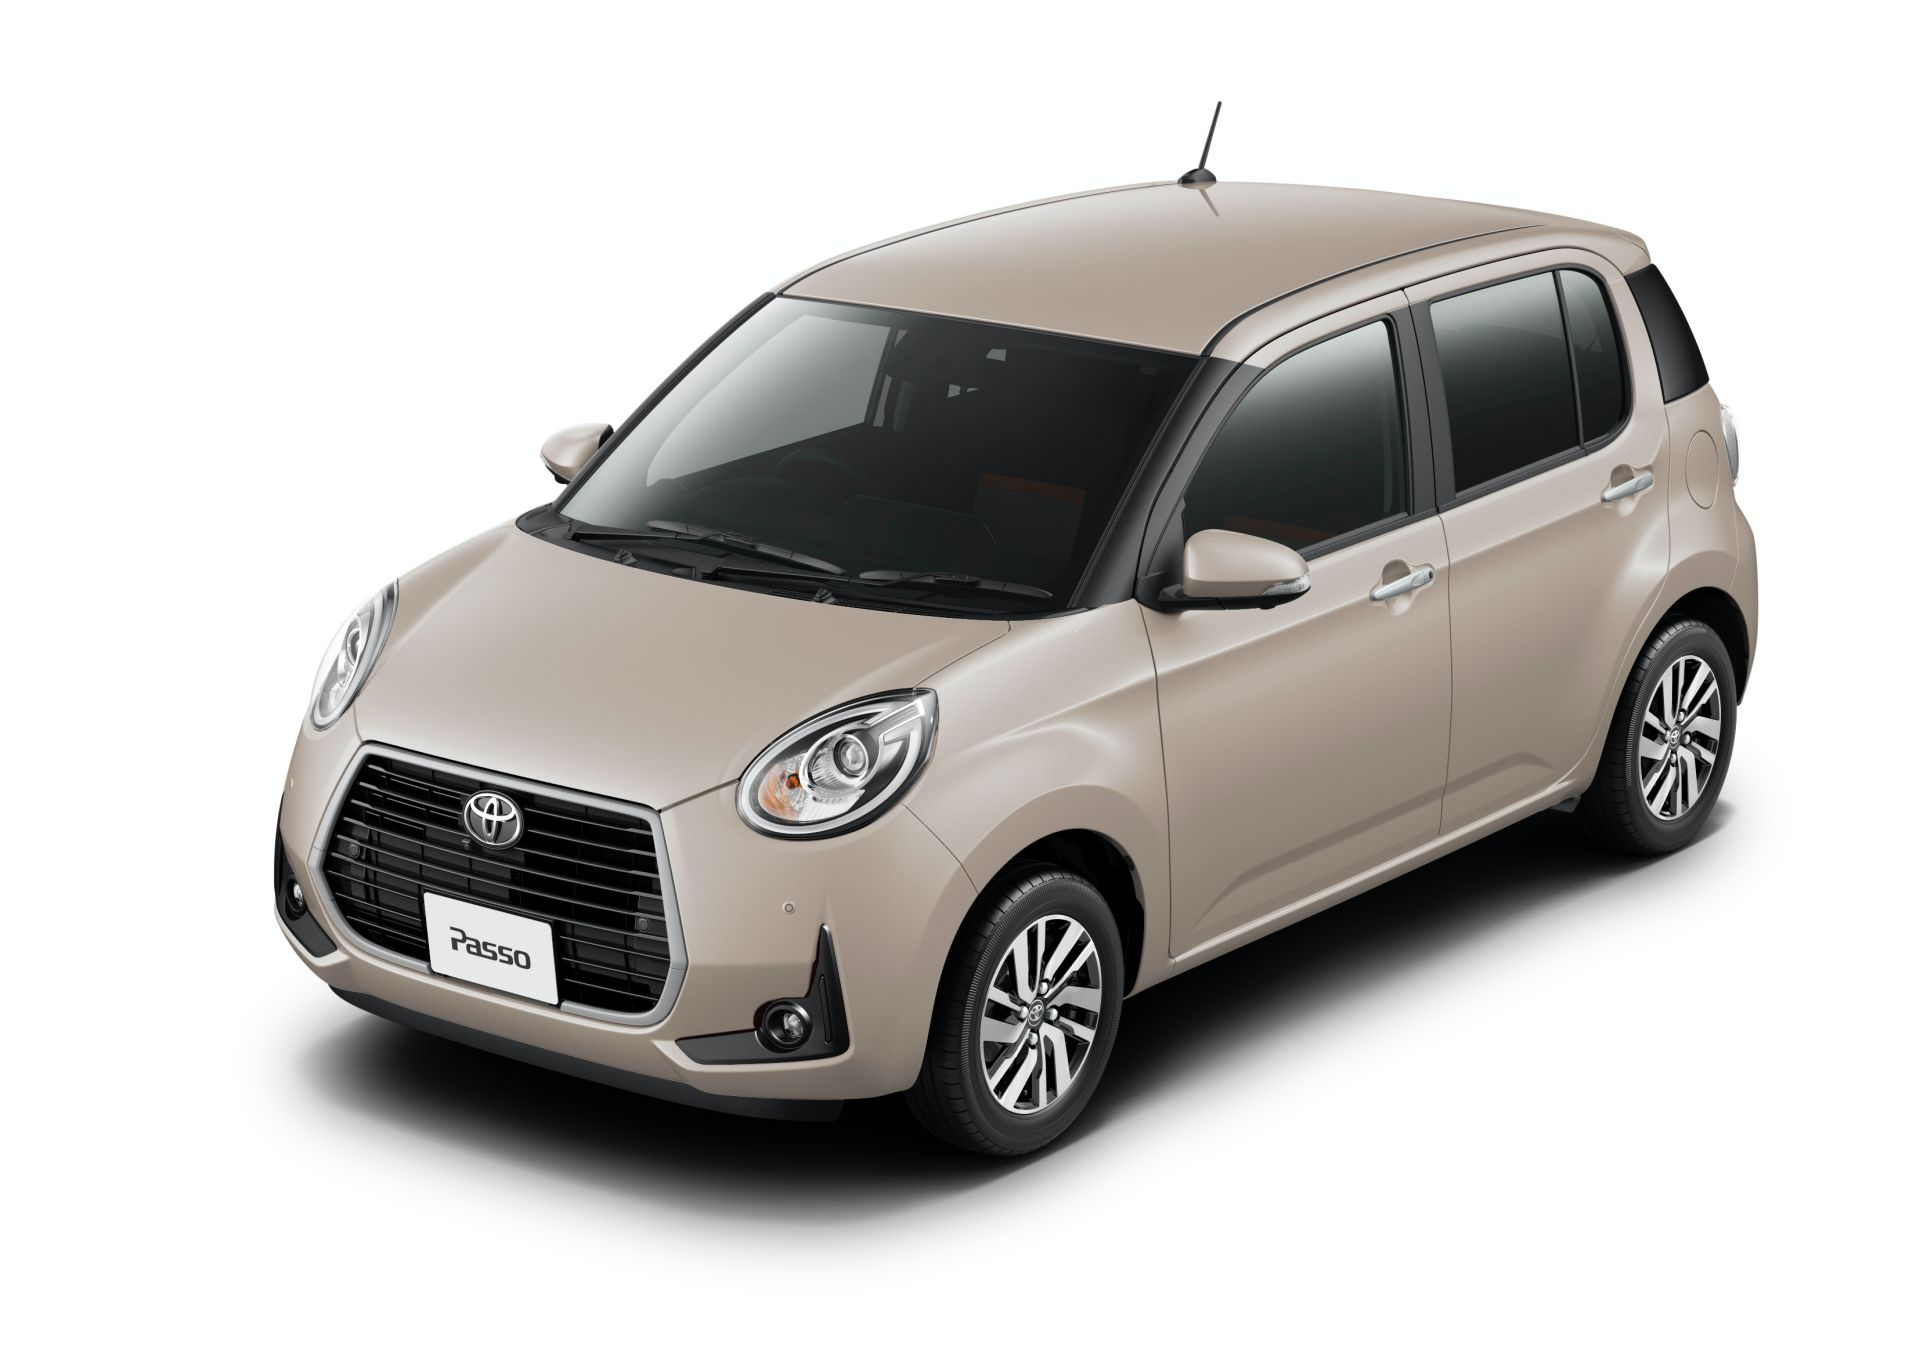 Toyota_Passo_Moda_Charm_0006